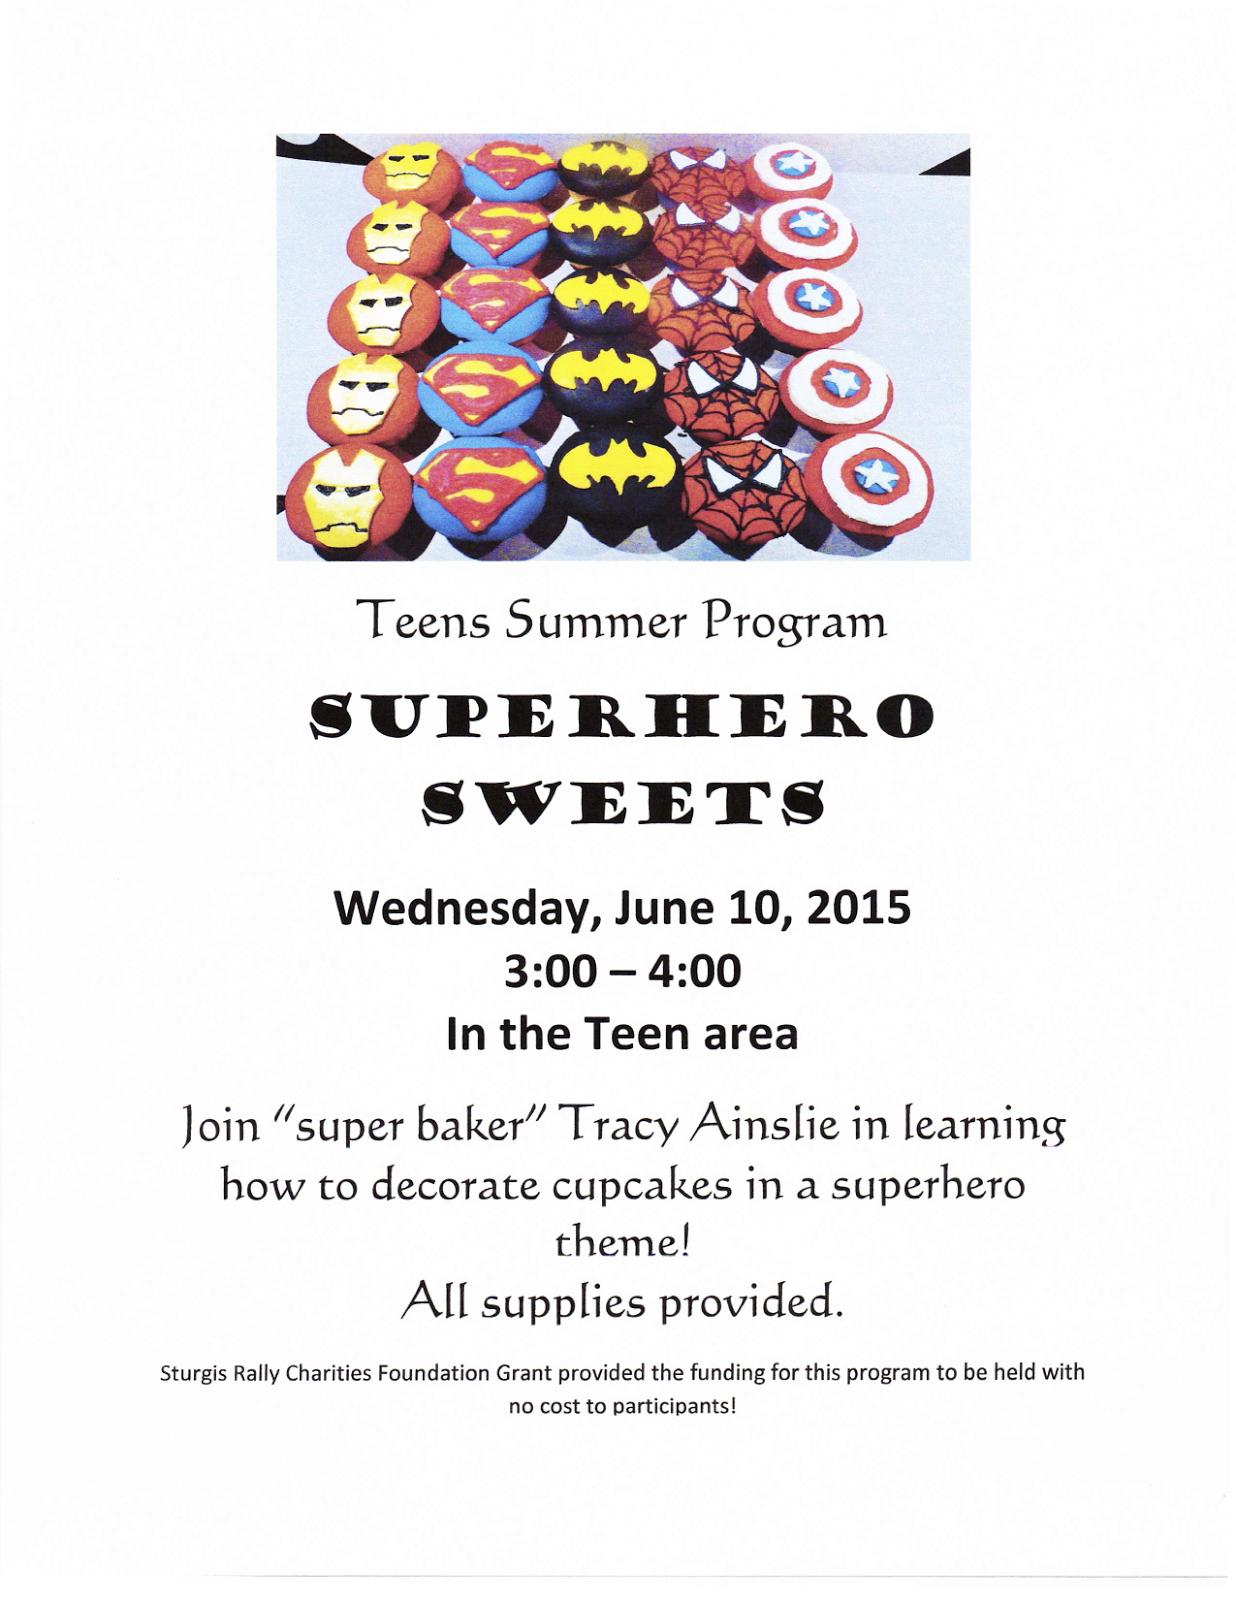 Toni sweets tabs - 3 1